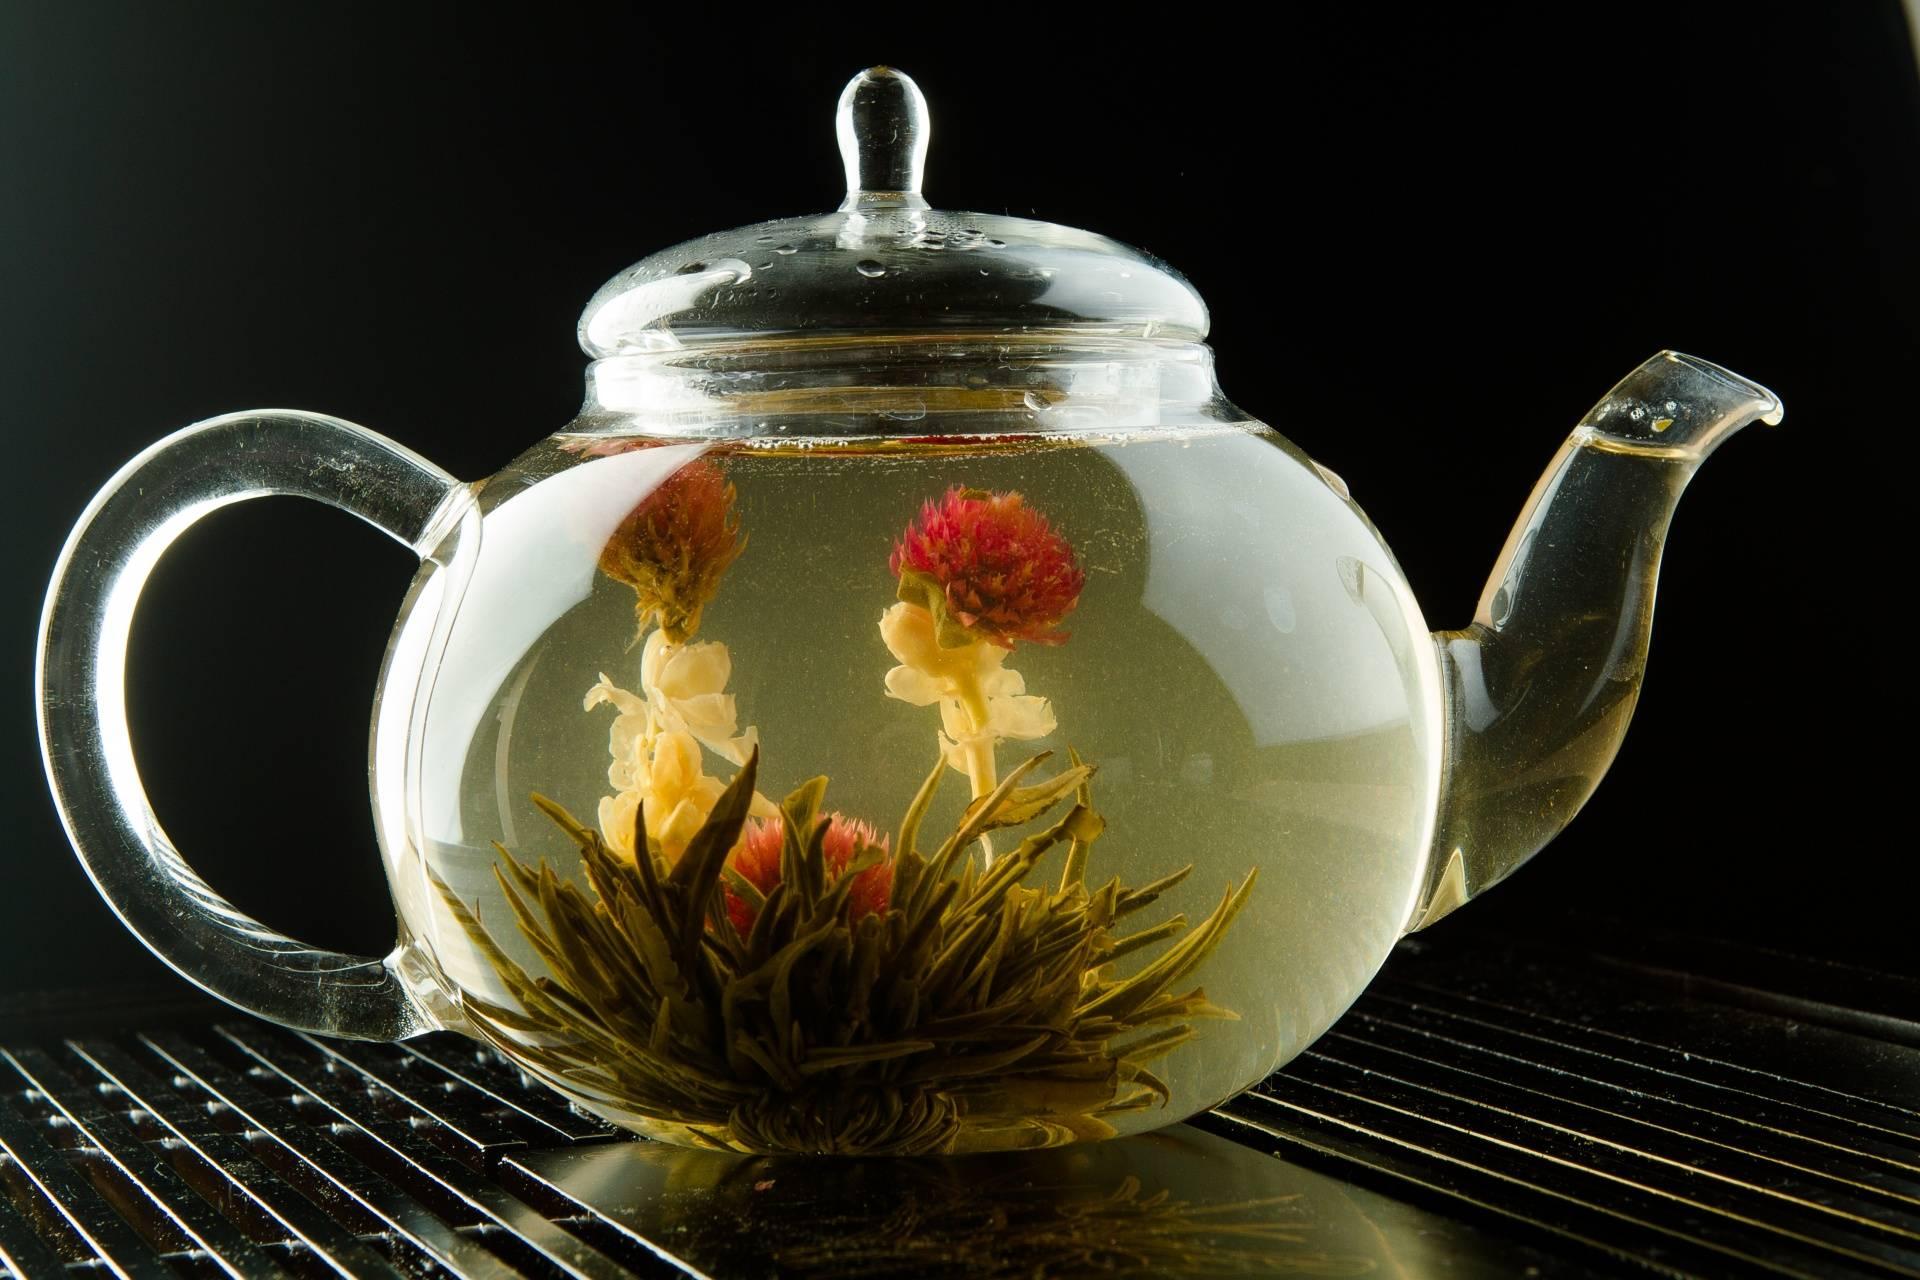 Чай: распускающийся цветок